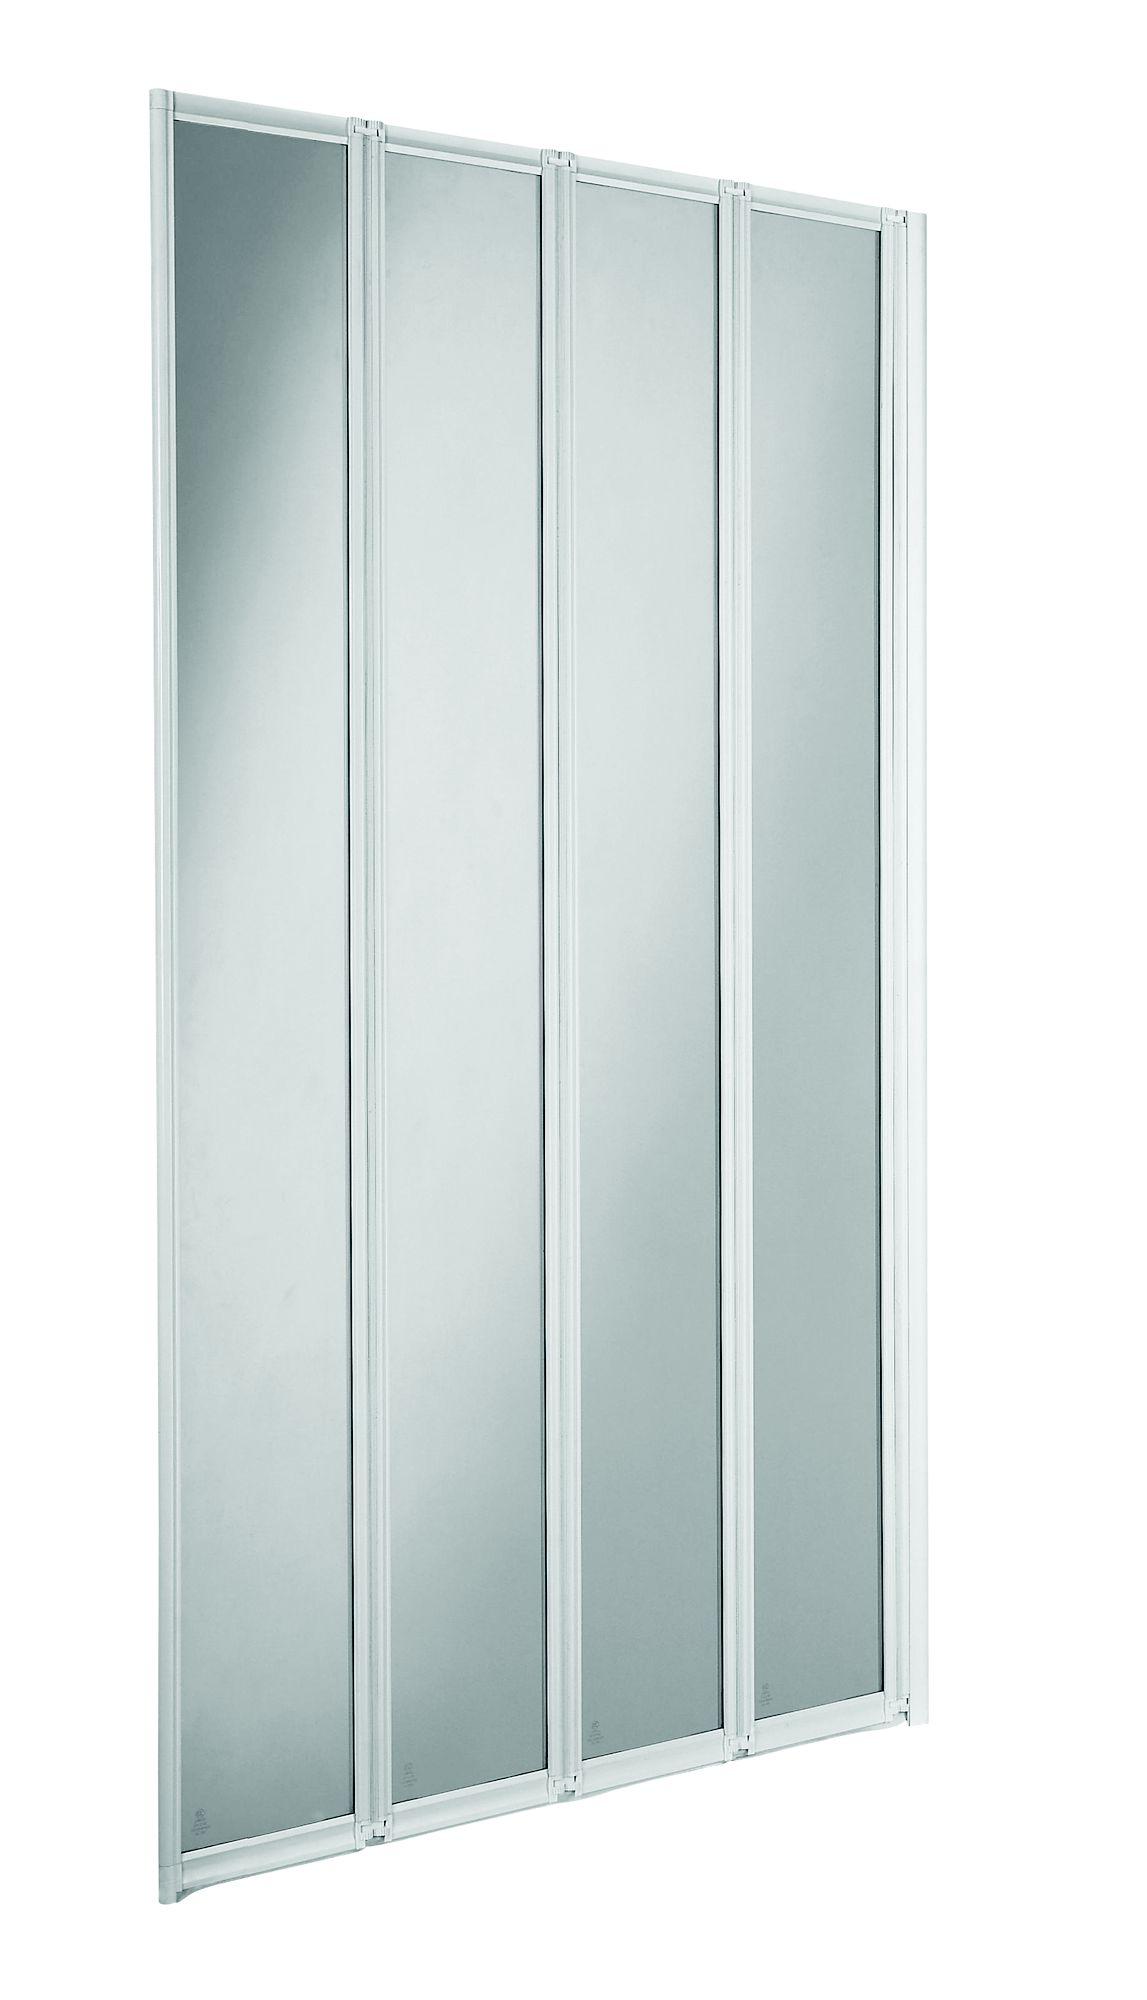 Cooke U0026 Lewis Nile Straight 4 Panel Folding Bath Screen (w)840mm